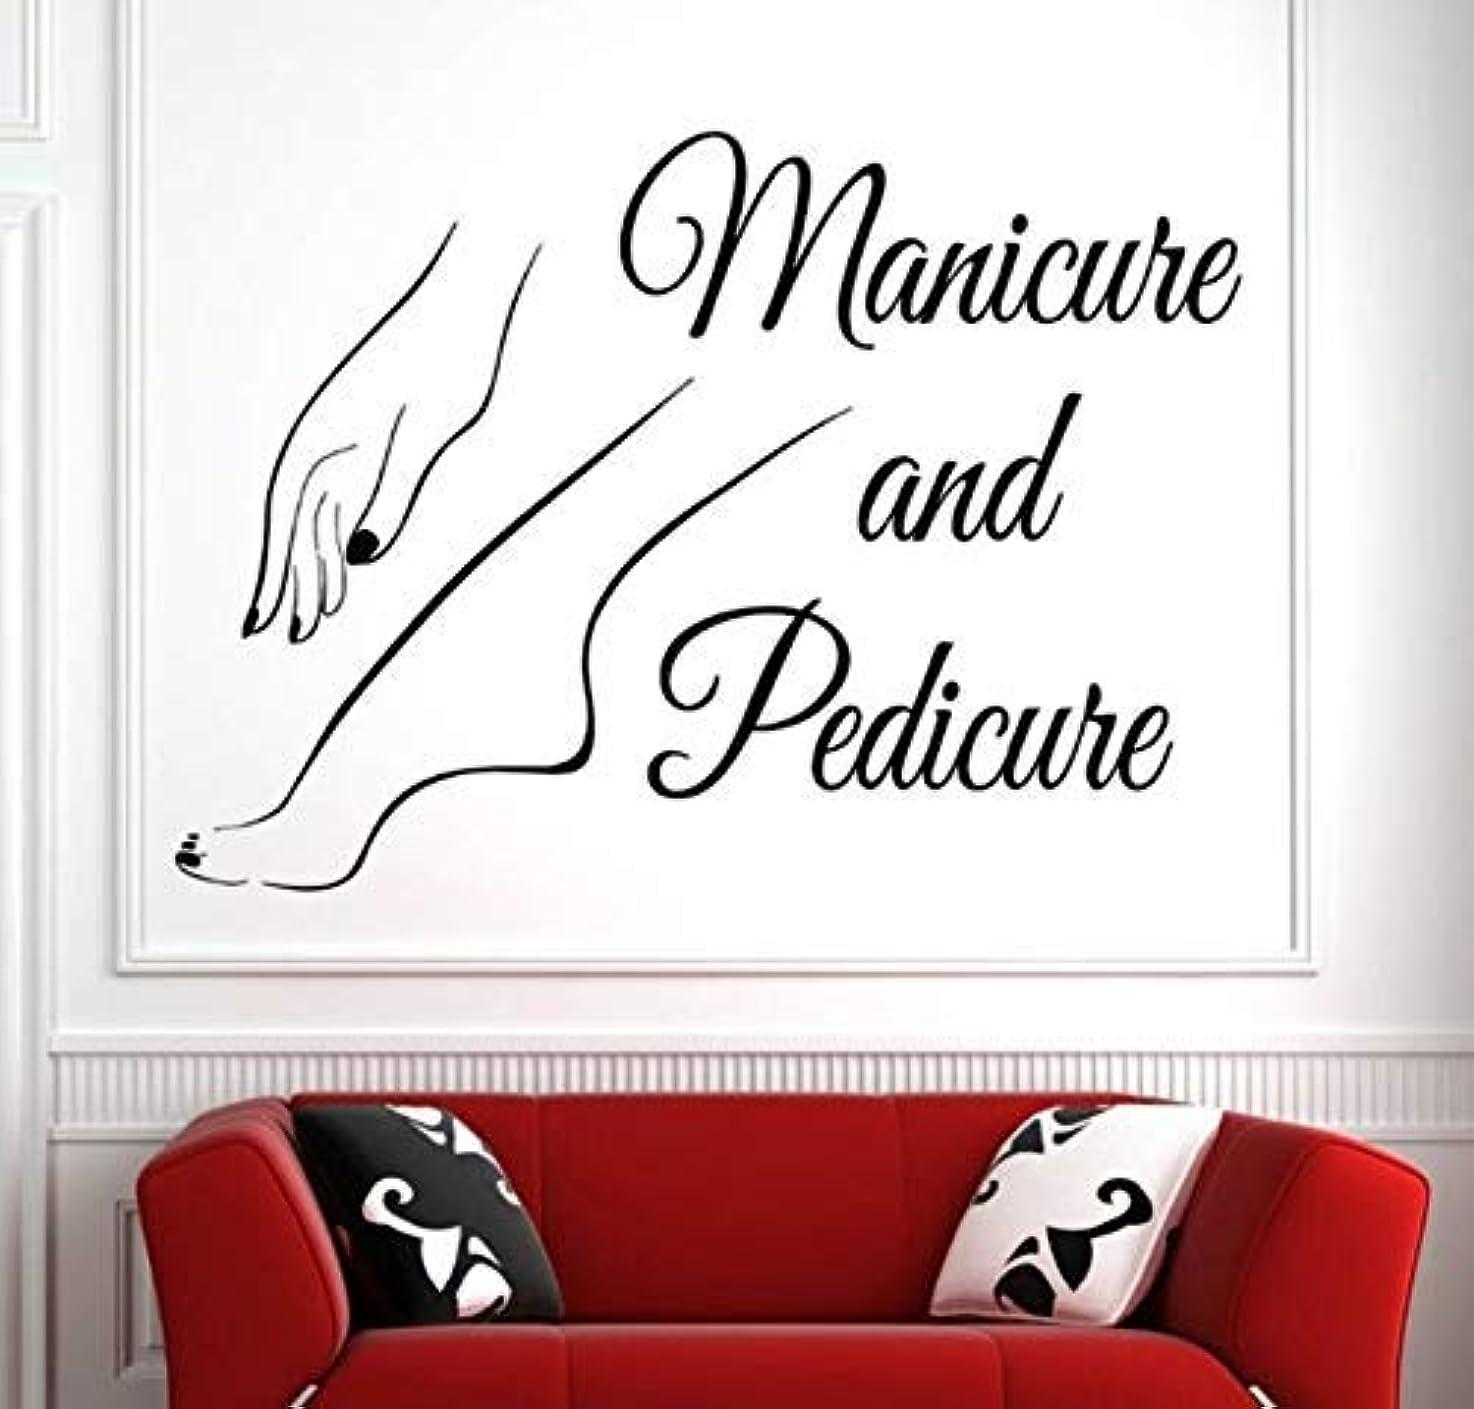 Enidgunter Vinyl Wall Window Decal Nail Art Polish Wall Sticker Beauty Salon Manicure Pedicure Wall Art Nail Salon Decor ation 80X57cm